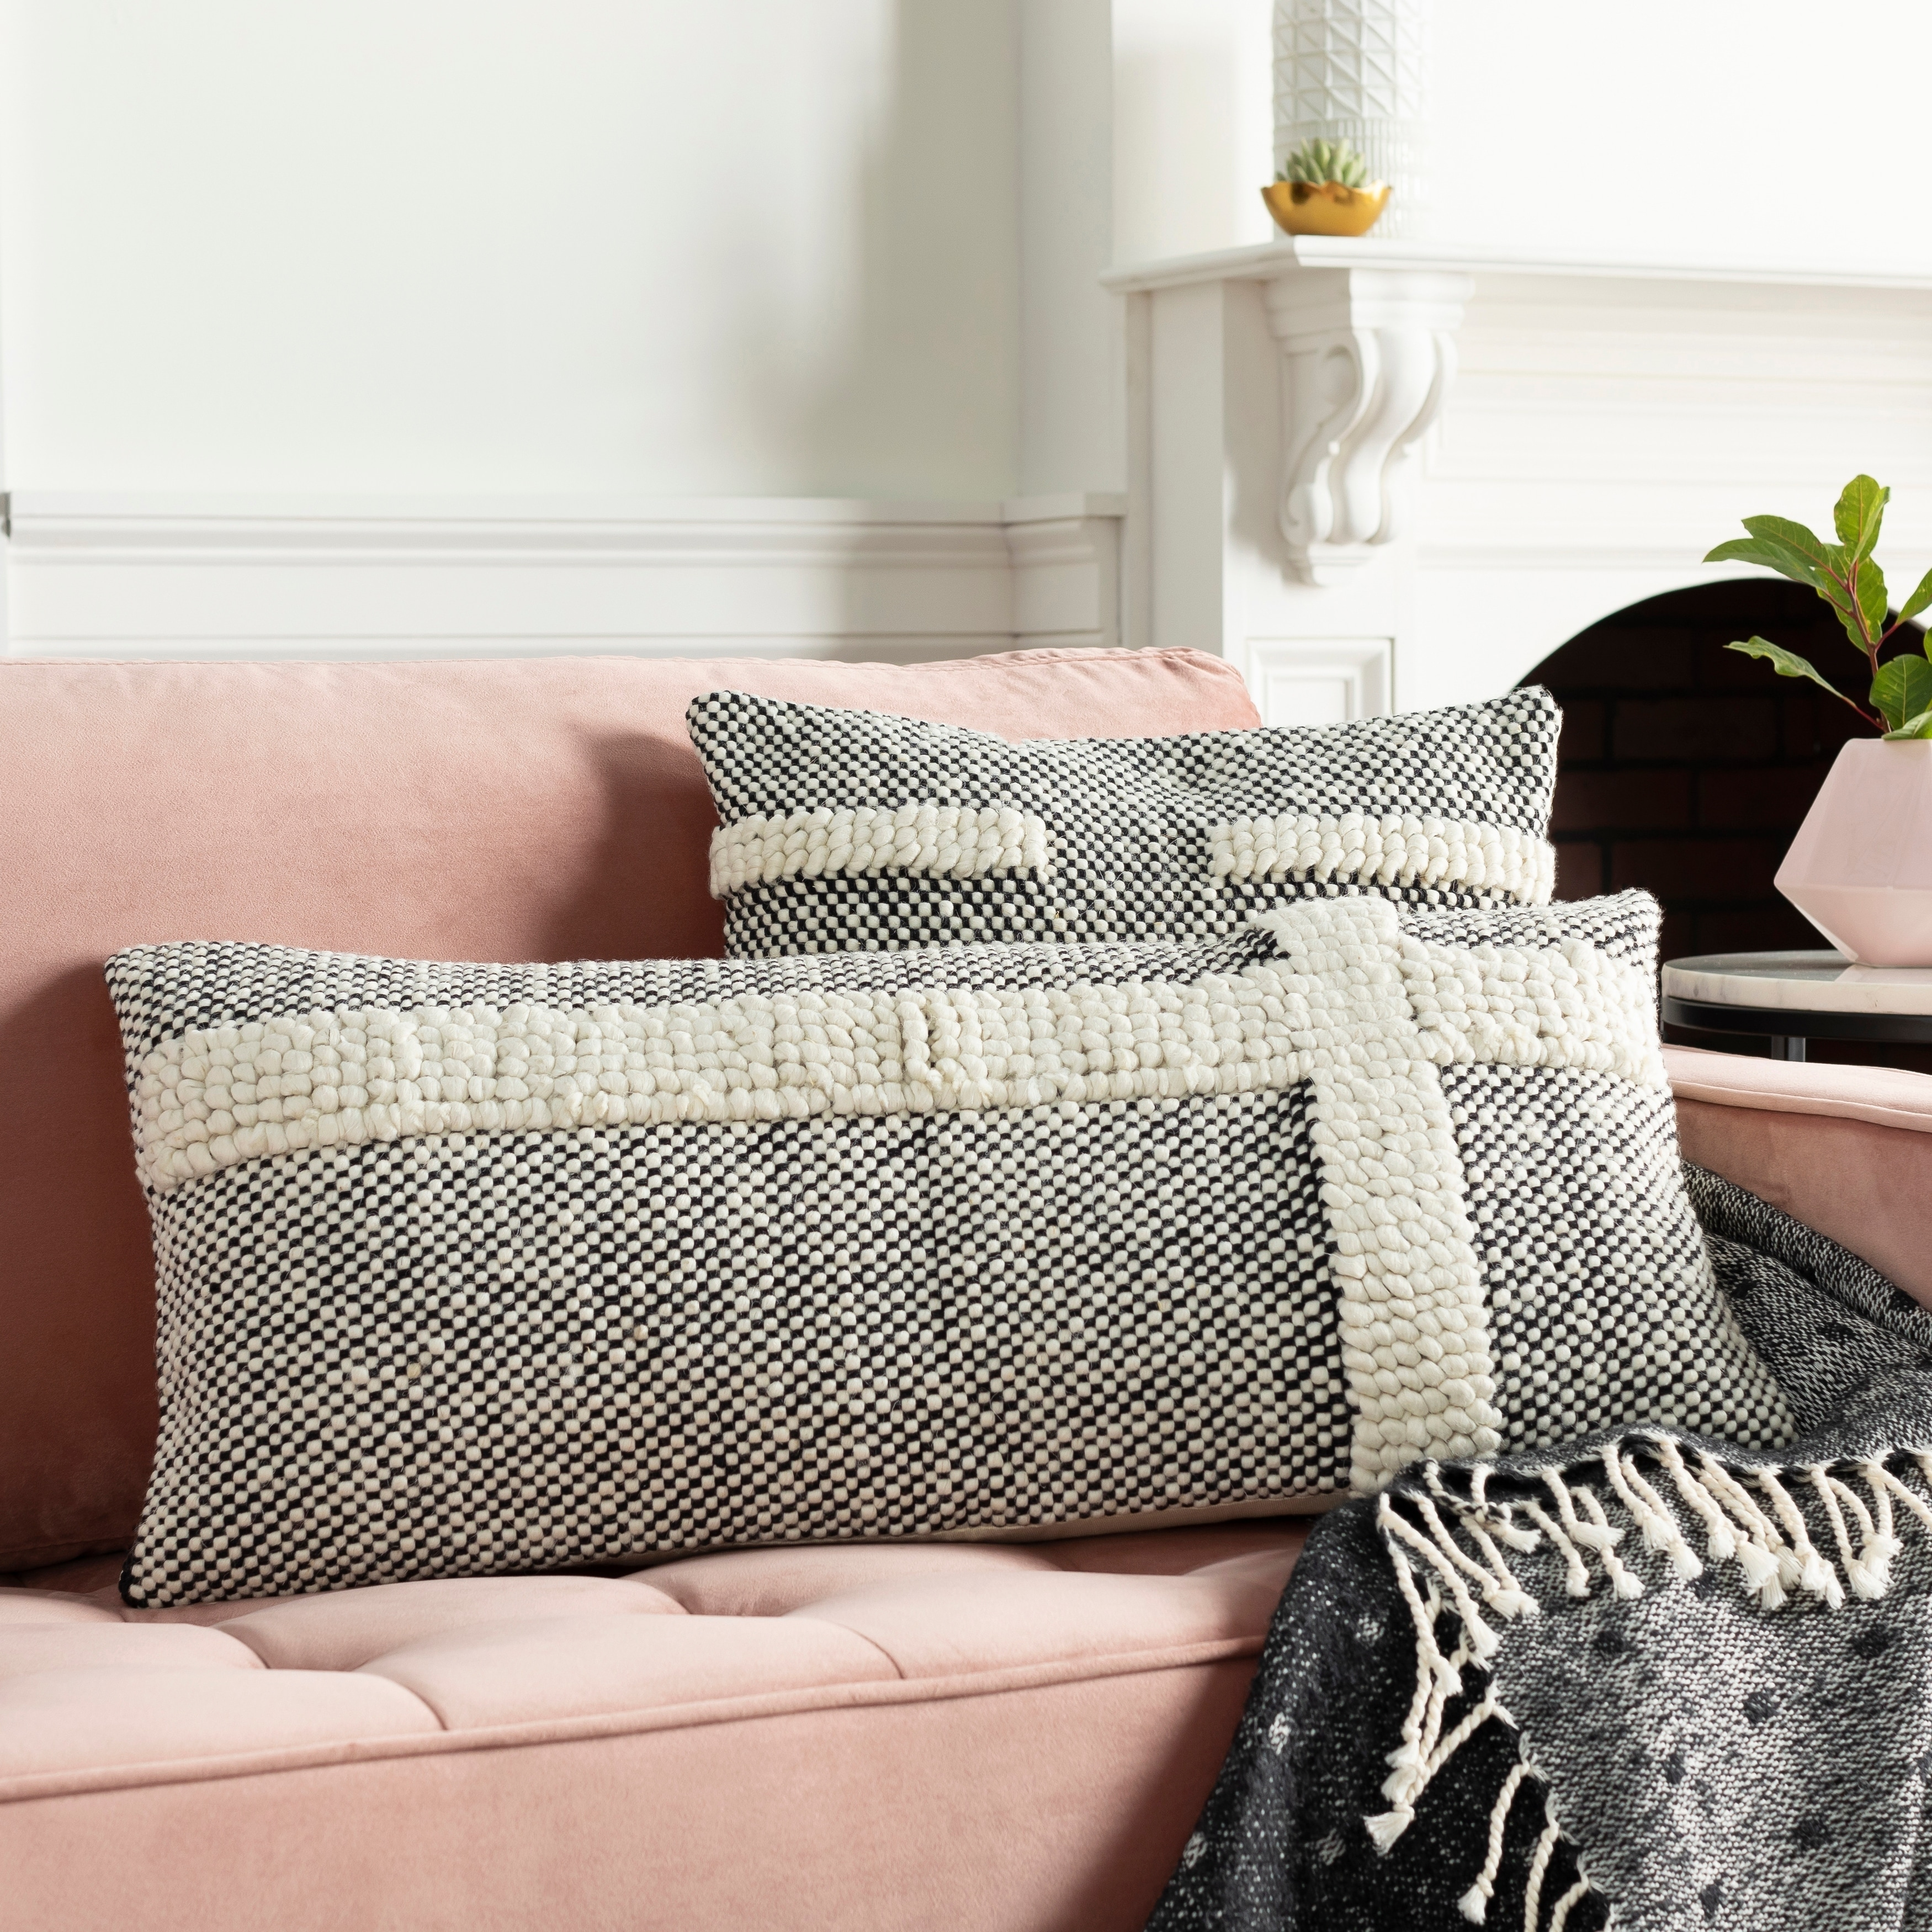 hadrea handwoven black white boho 14x32 inch lumbar throw pillow